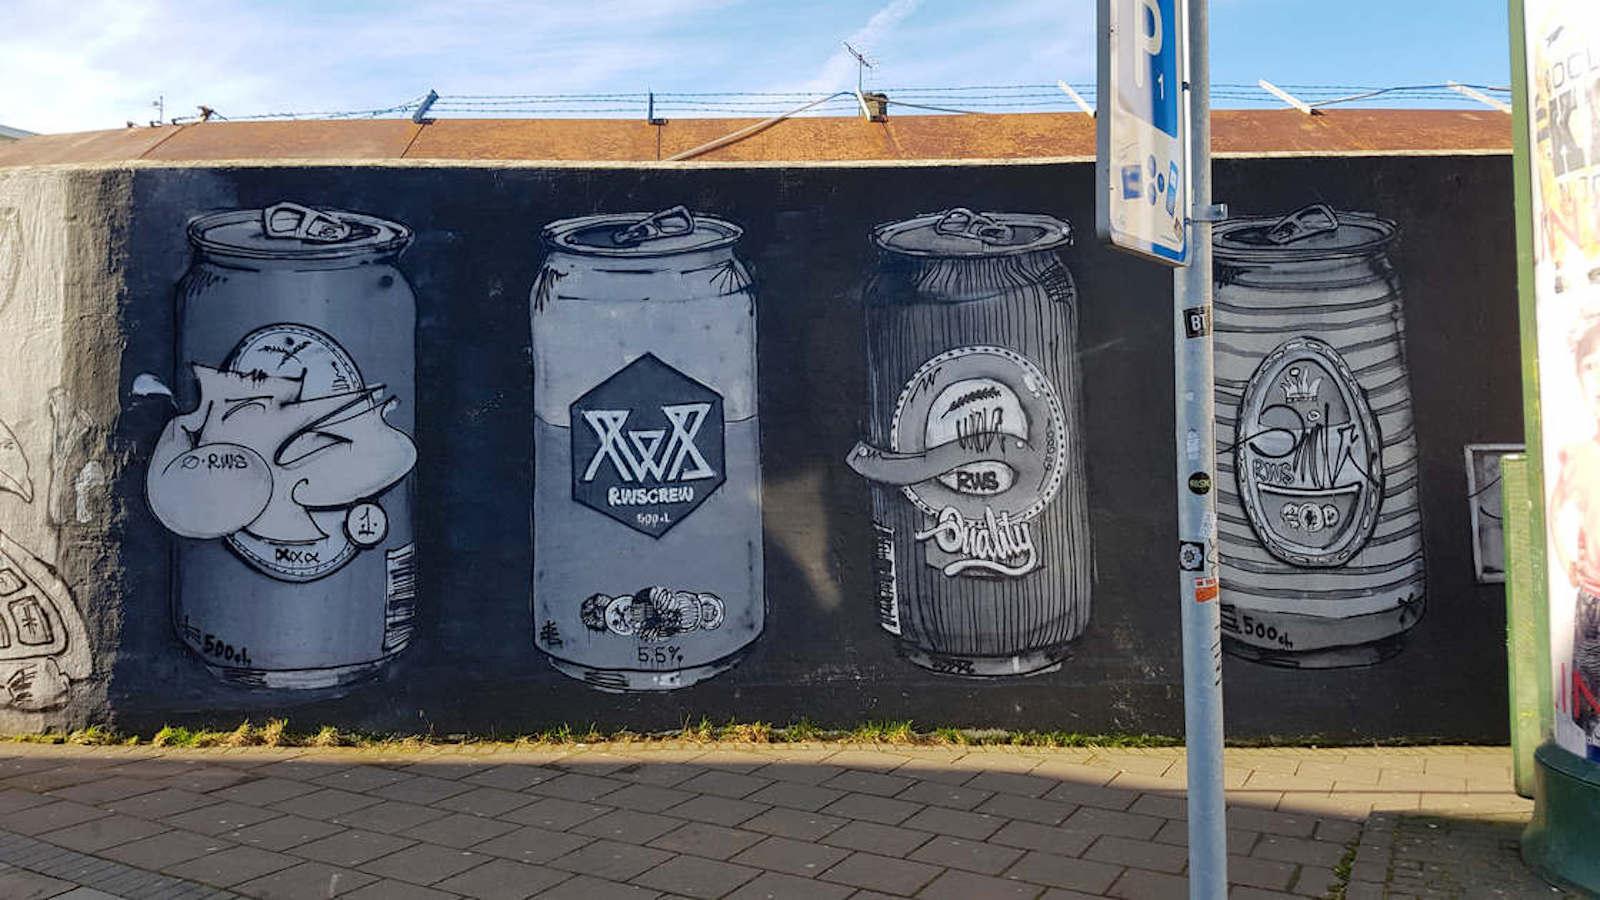 ufunk-reykjavik-street-art-6.jpg